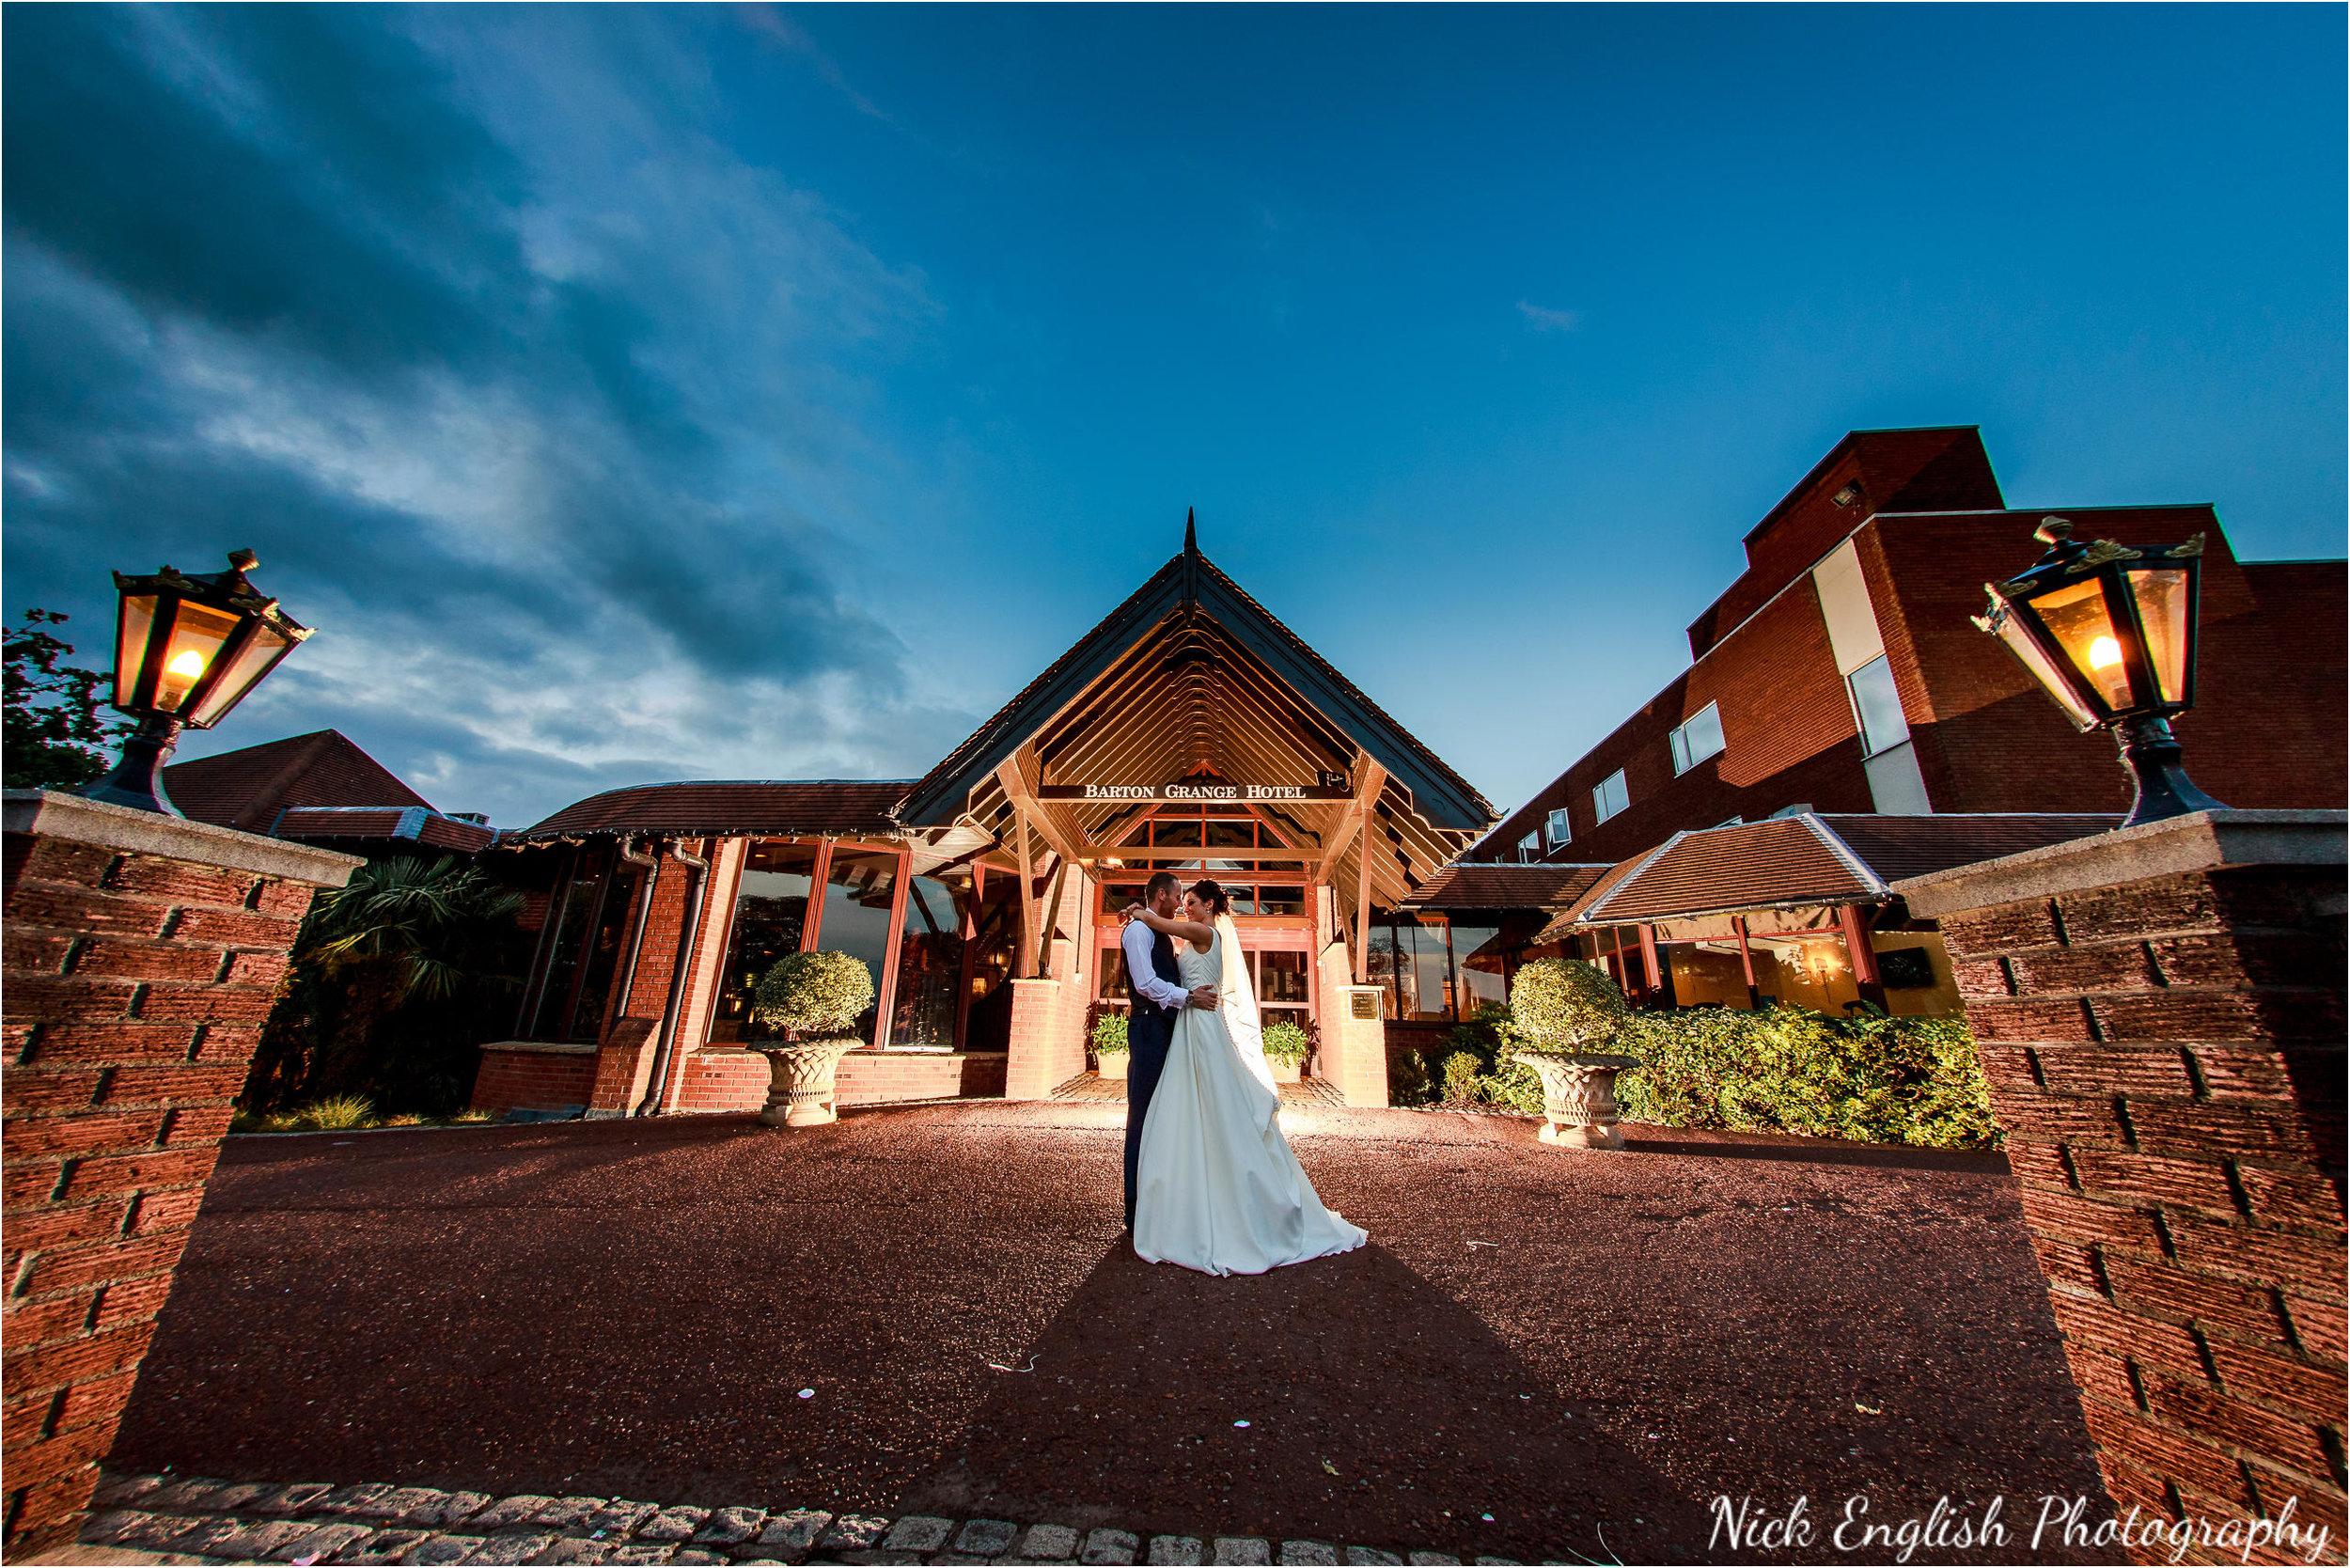 Emily David Wedding Photographs at Barton Grange Preston by Nick English Photography 238jpg.jpeg